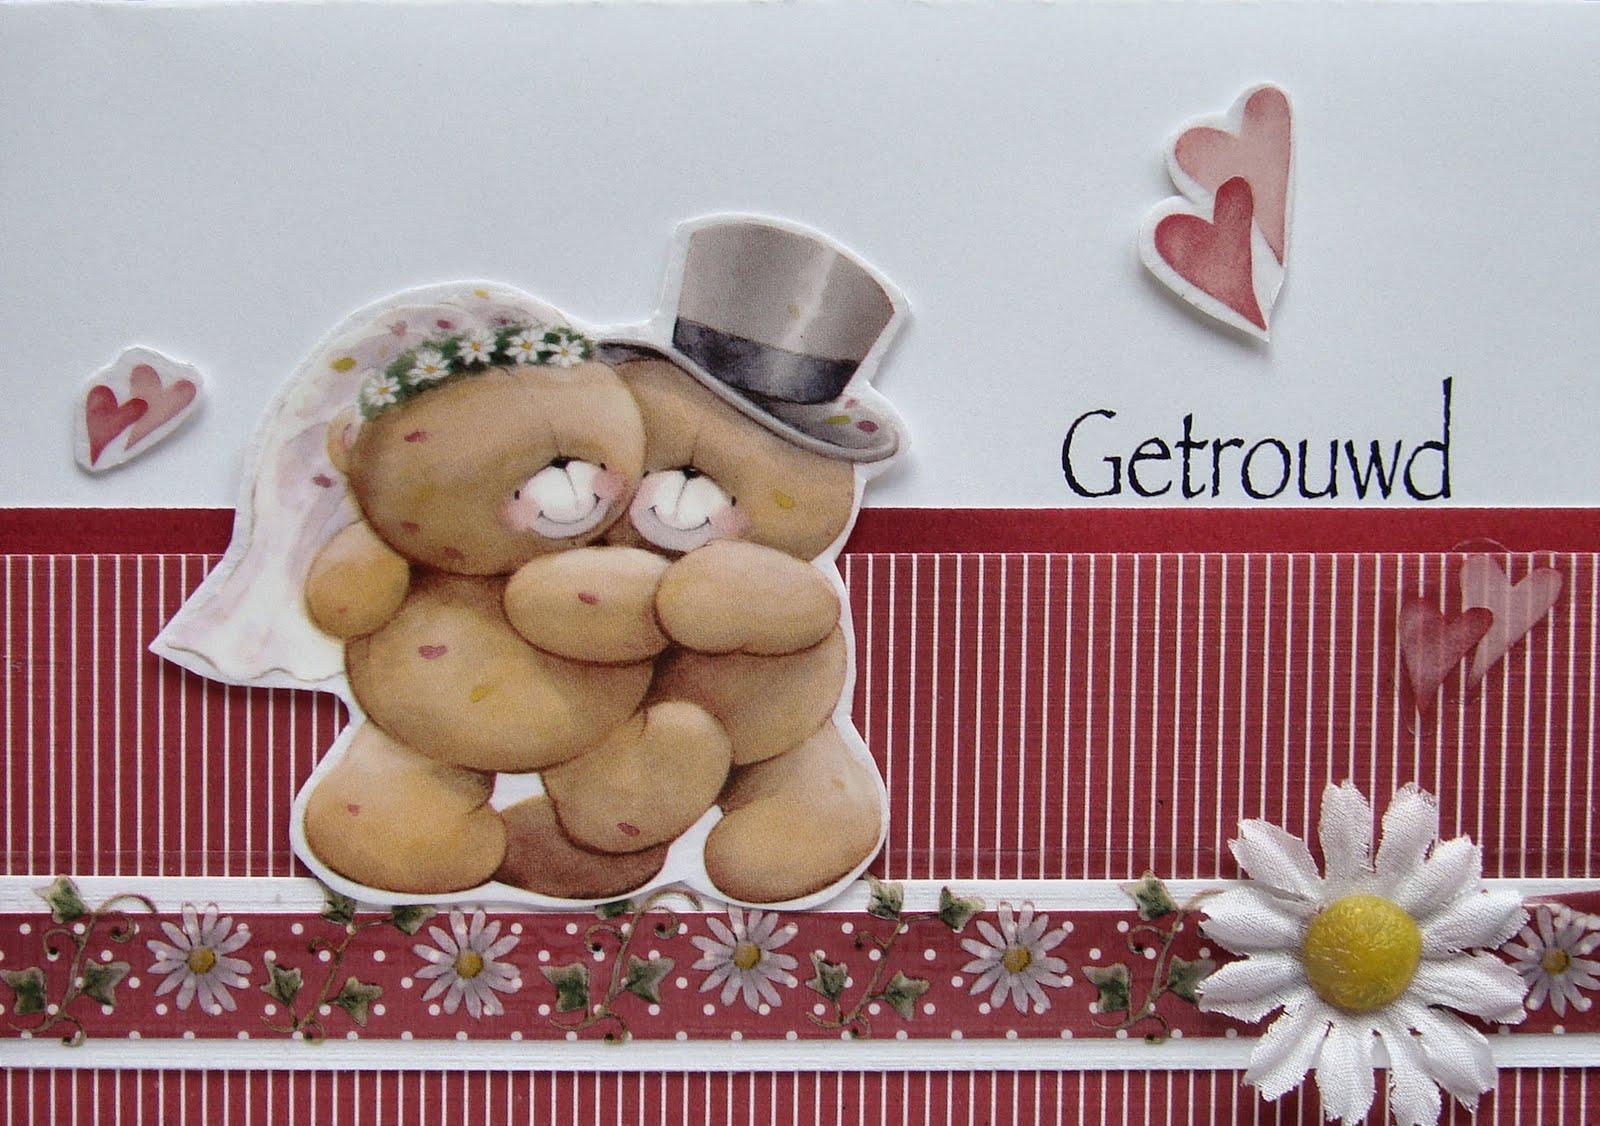 http://1.bp.blogspot.com/_YchV4EQ3gRE/TJRhyWKJHTI/AAAAAAAAAq4/ZMNAMHrAleA/s1600/Forever+Friends+getrouwd.jpg